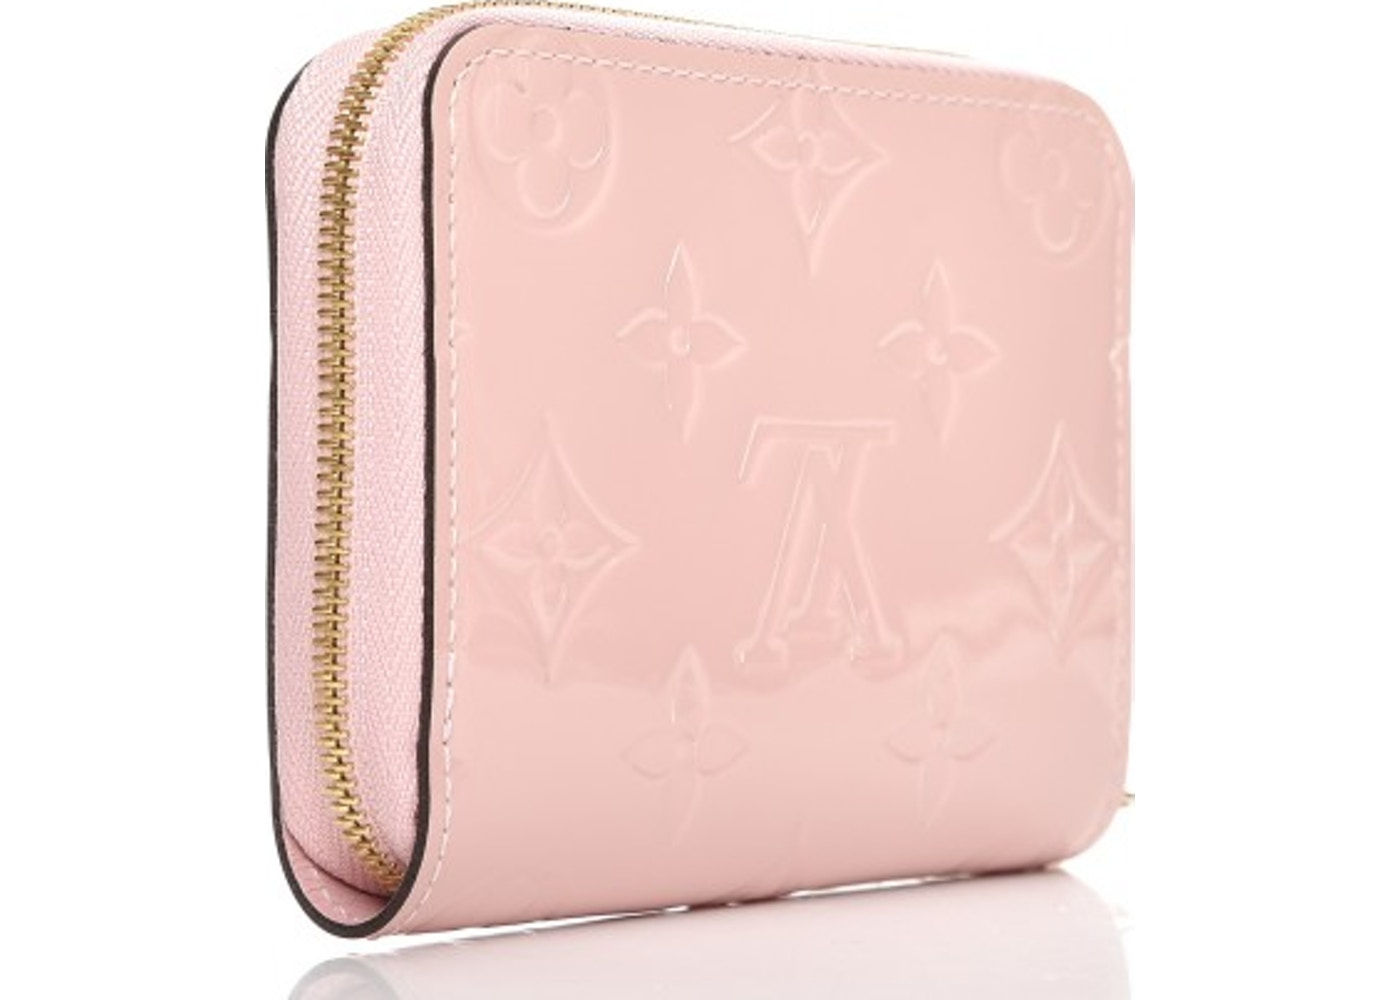 6f7d7d0cfa35 Louis Vuitton Zippy Coin Purse Monogram Vernis Rose Ballerine